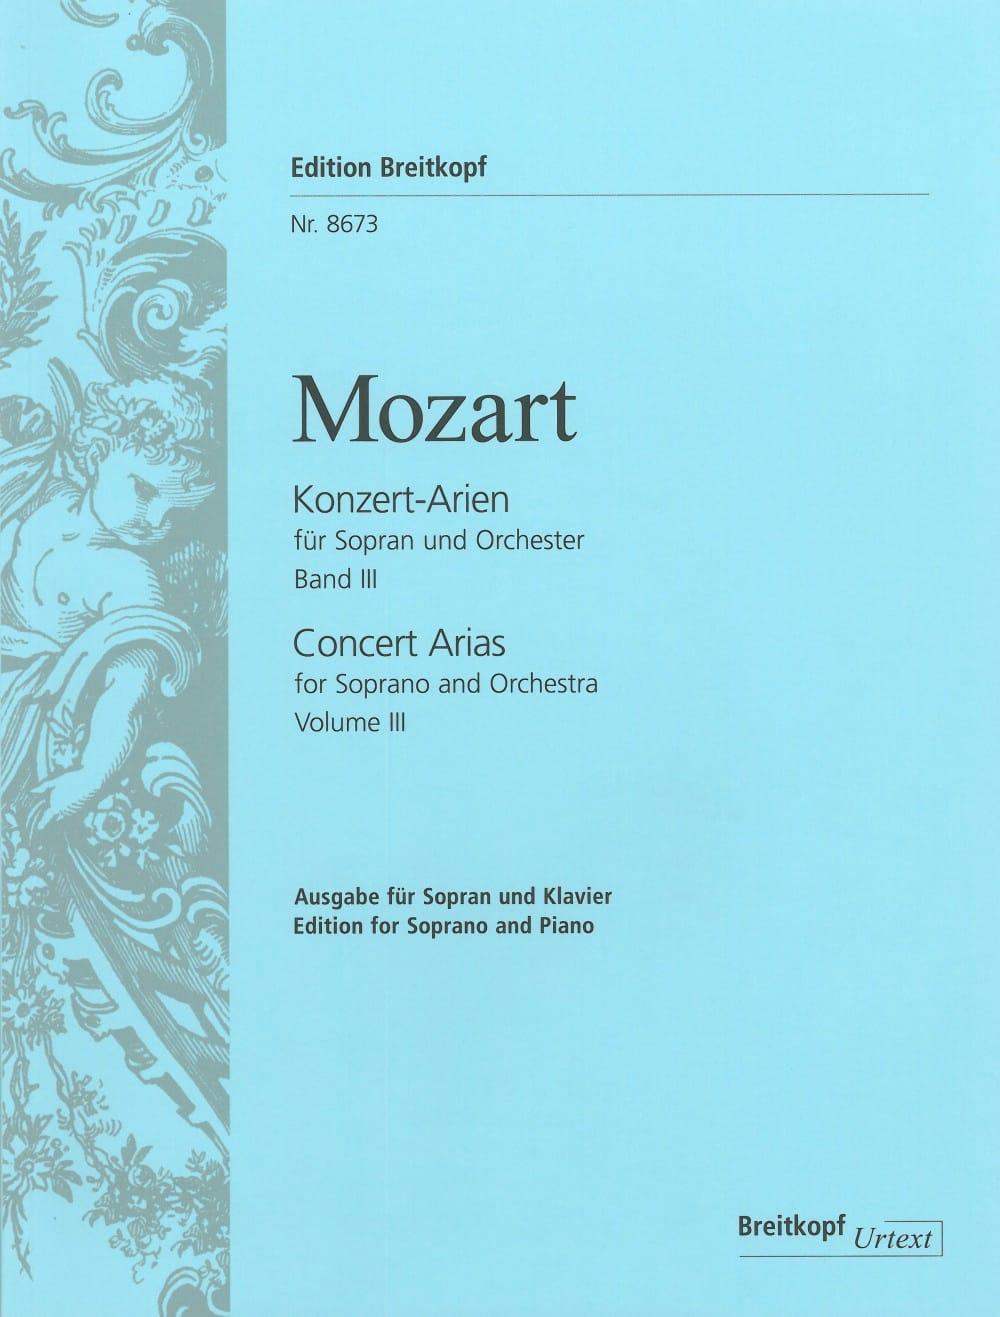 Konzert Arien Soprano Volume 3 - MOZART - Partition - laflutedepan.com